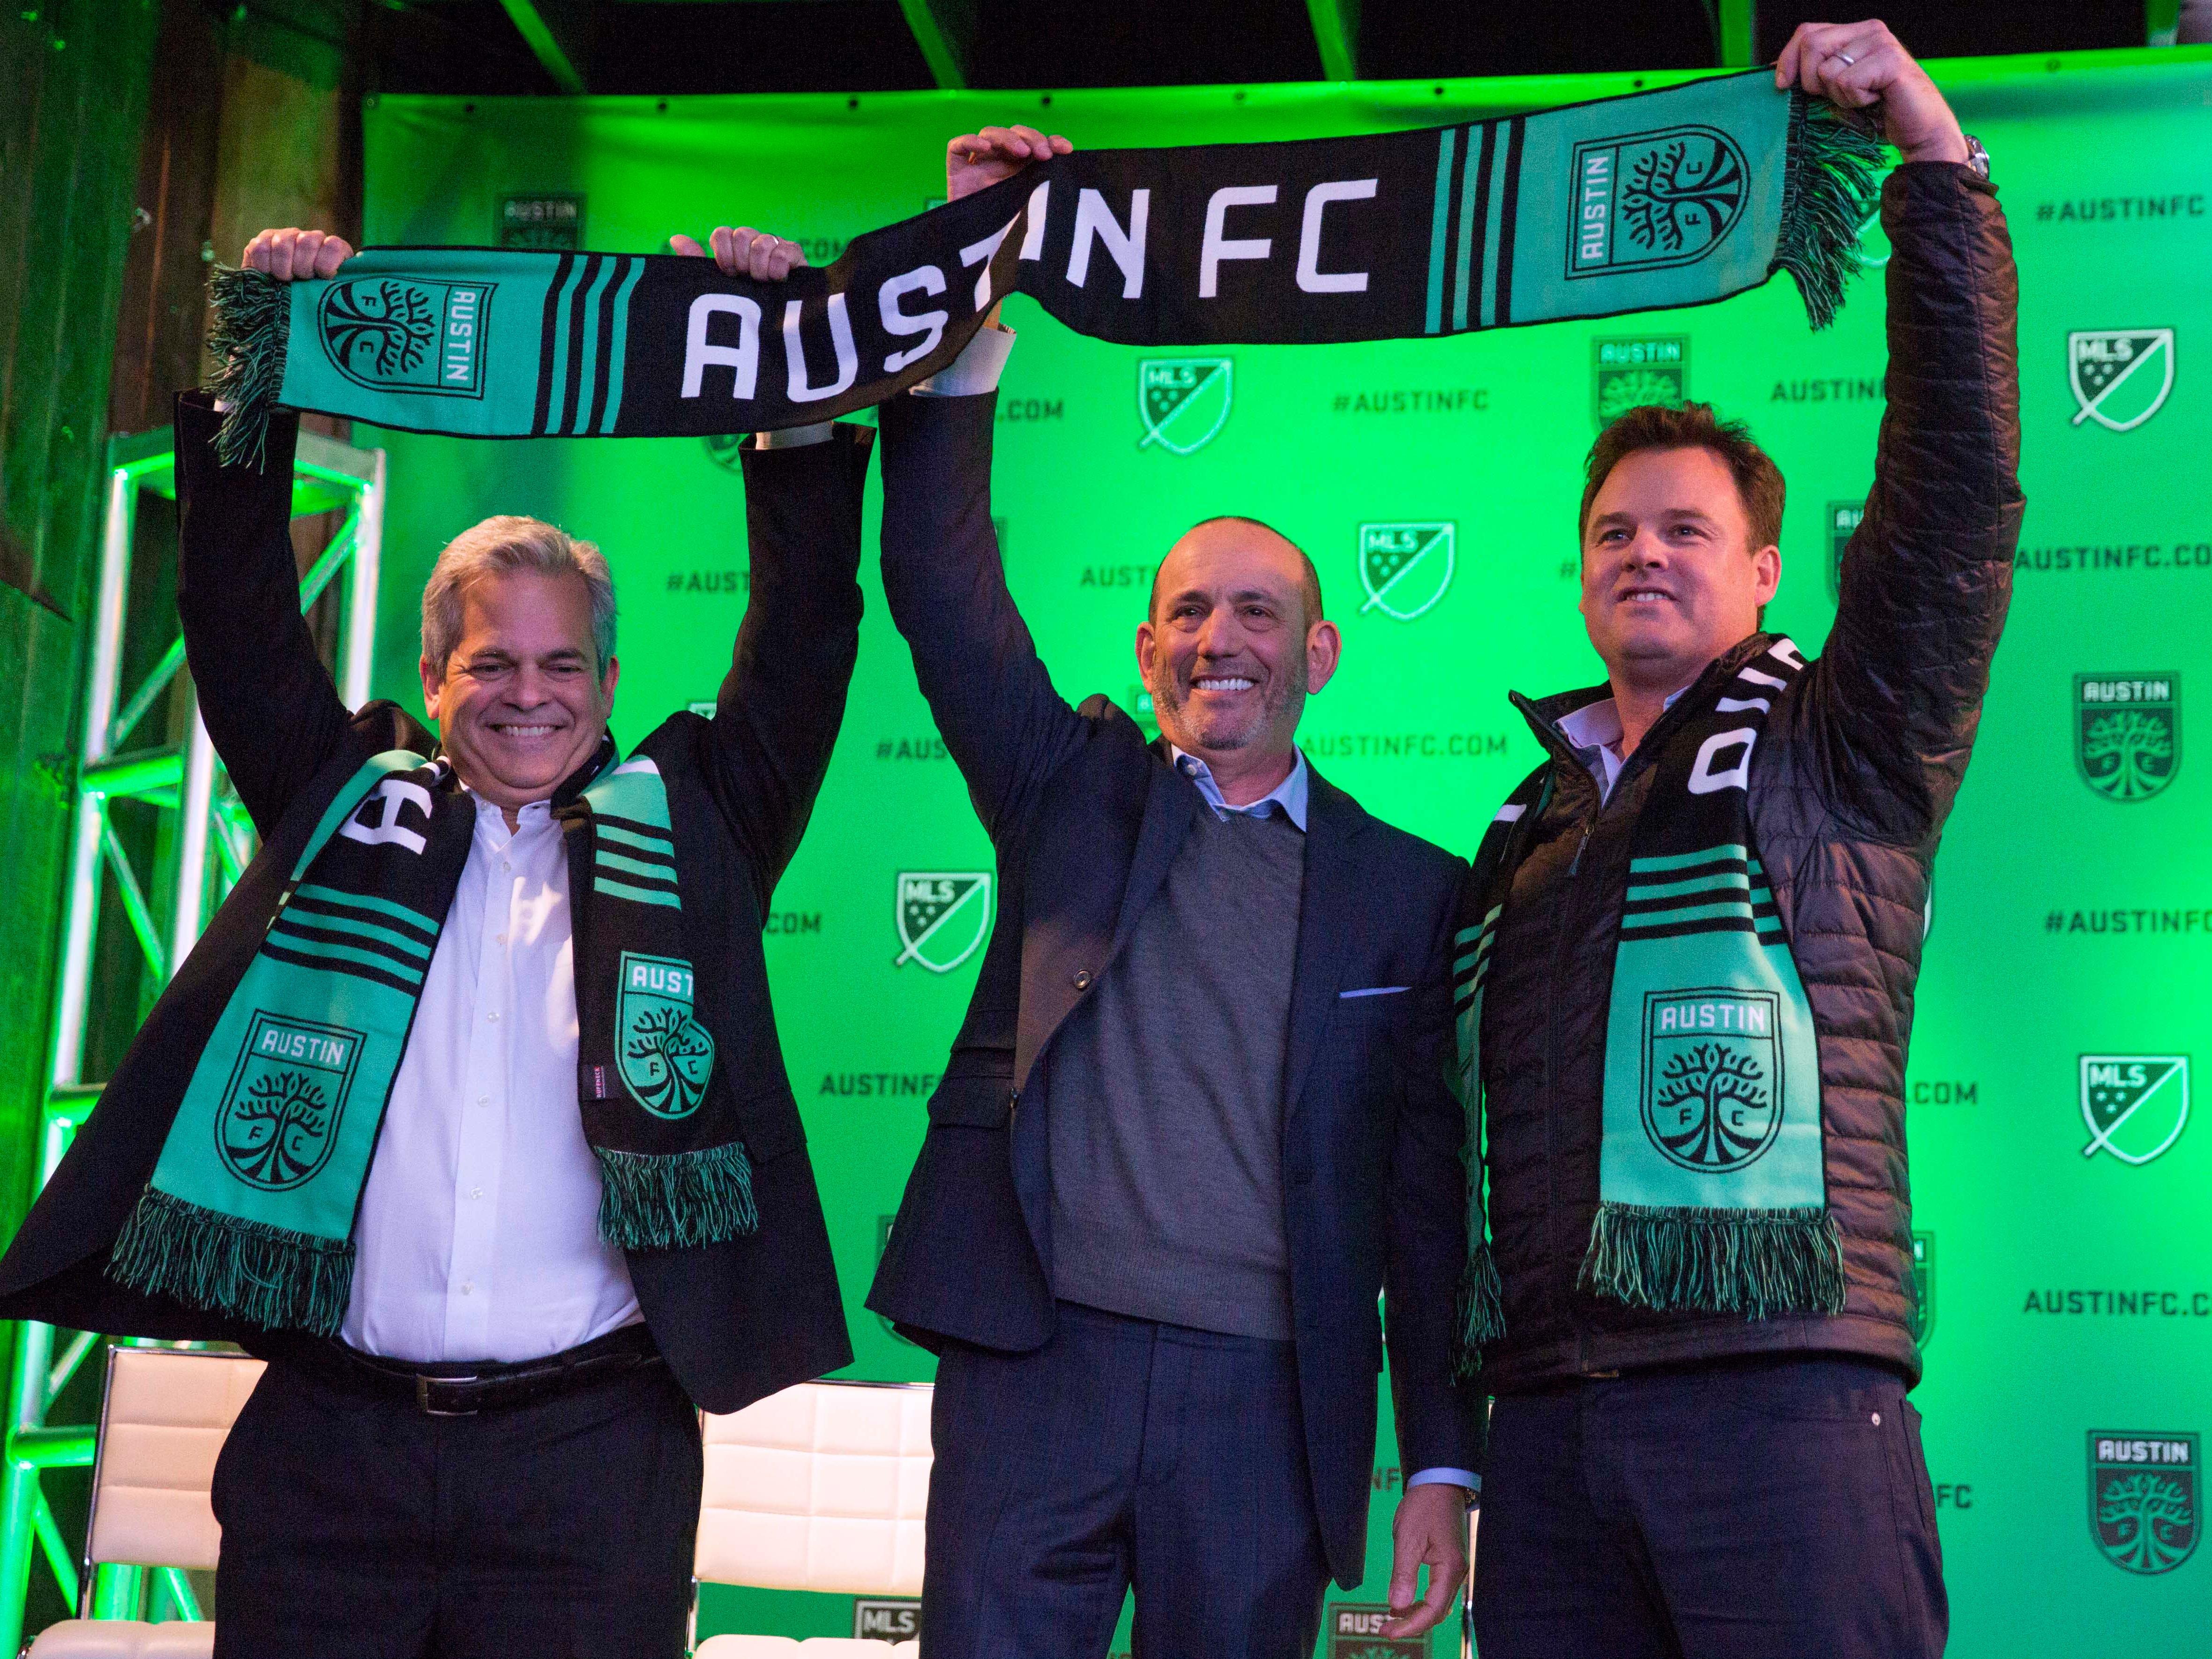 Major League Soccer formally announces Austin expansion team for 2021